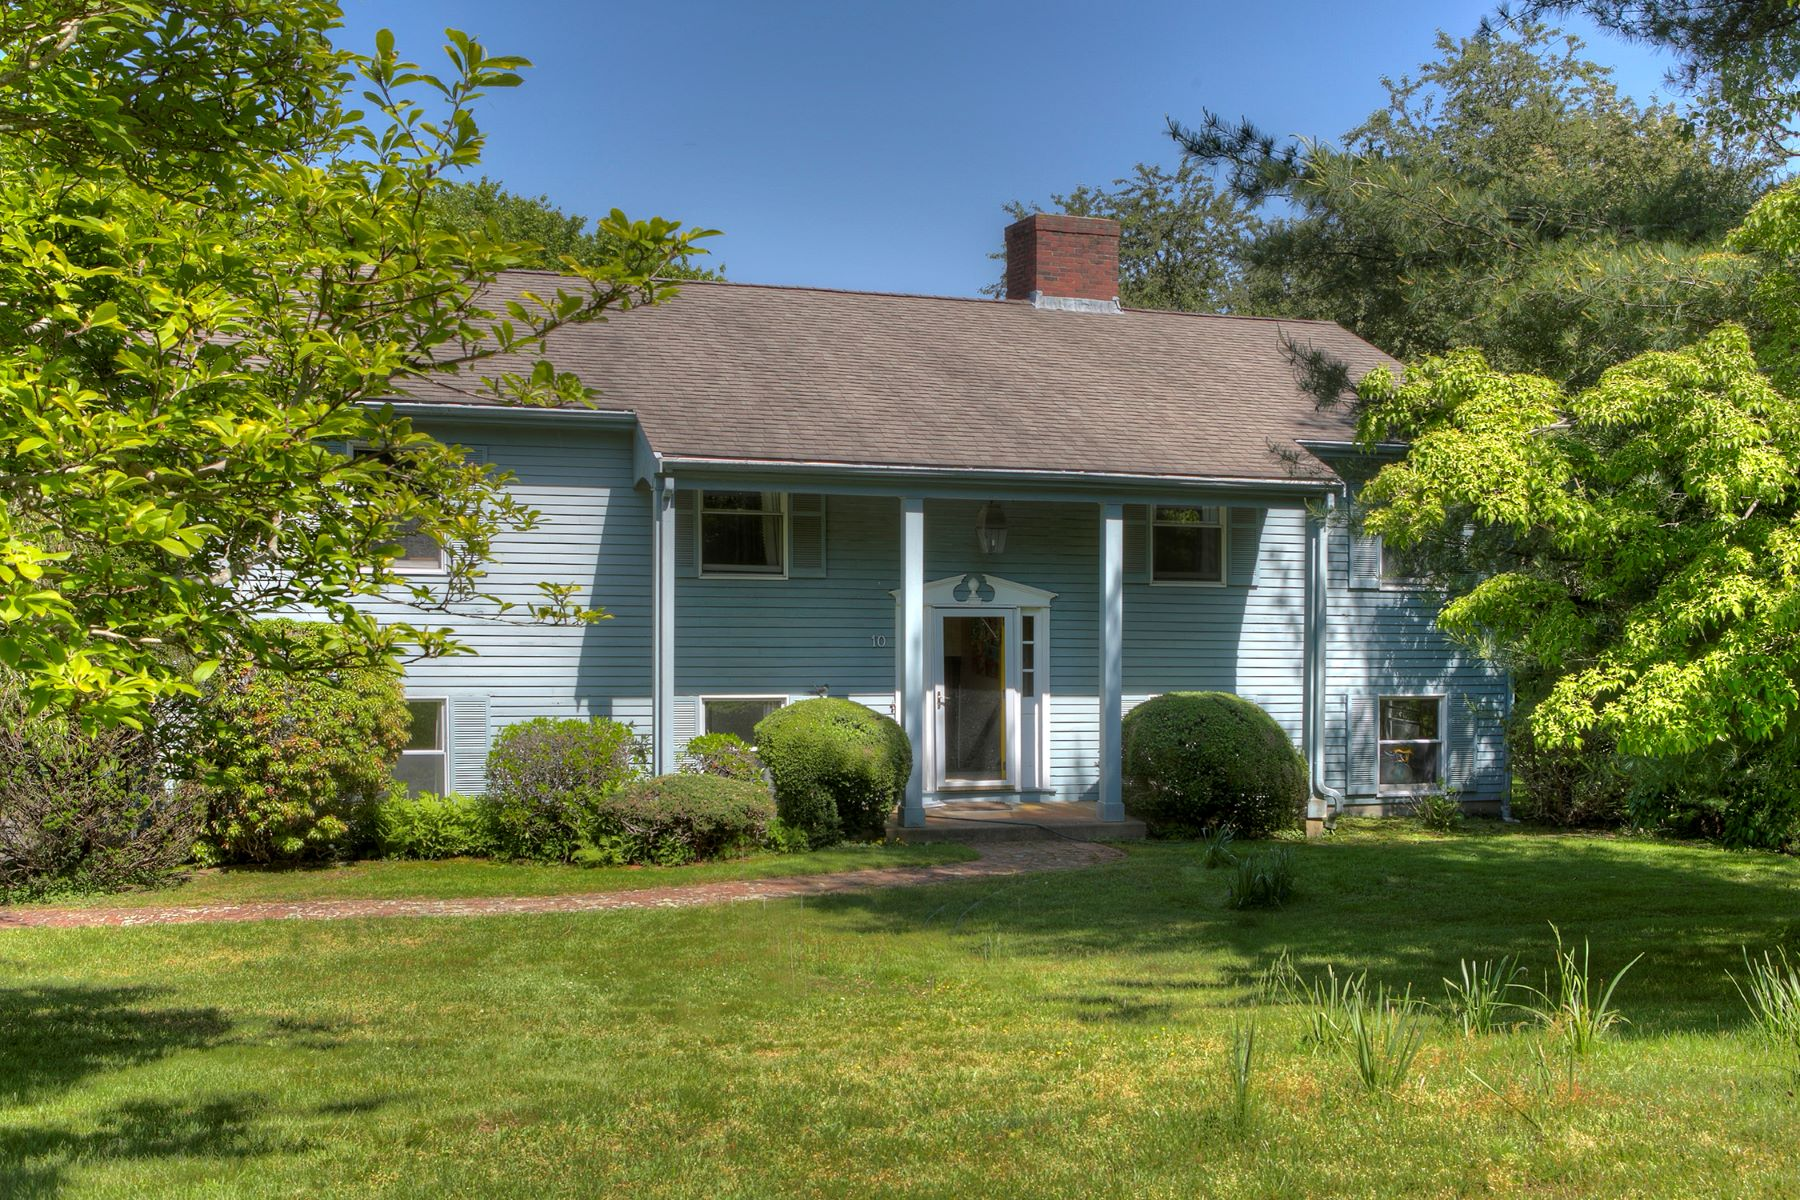 single family homes for Sale at Peckham Estates 10 Porter Road, Middletown, Rhode Island 02842 United States